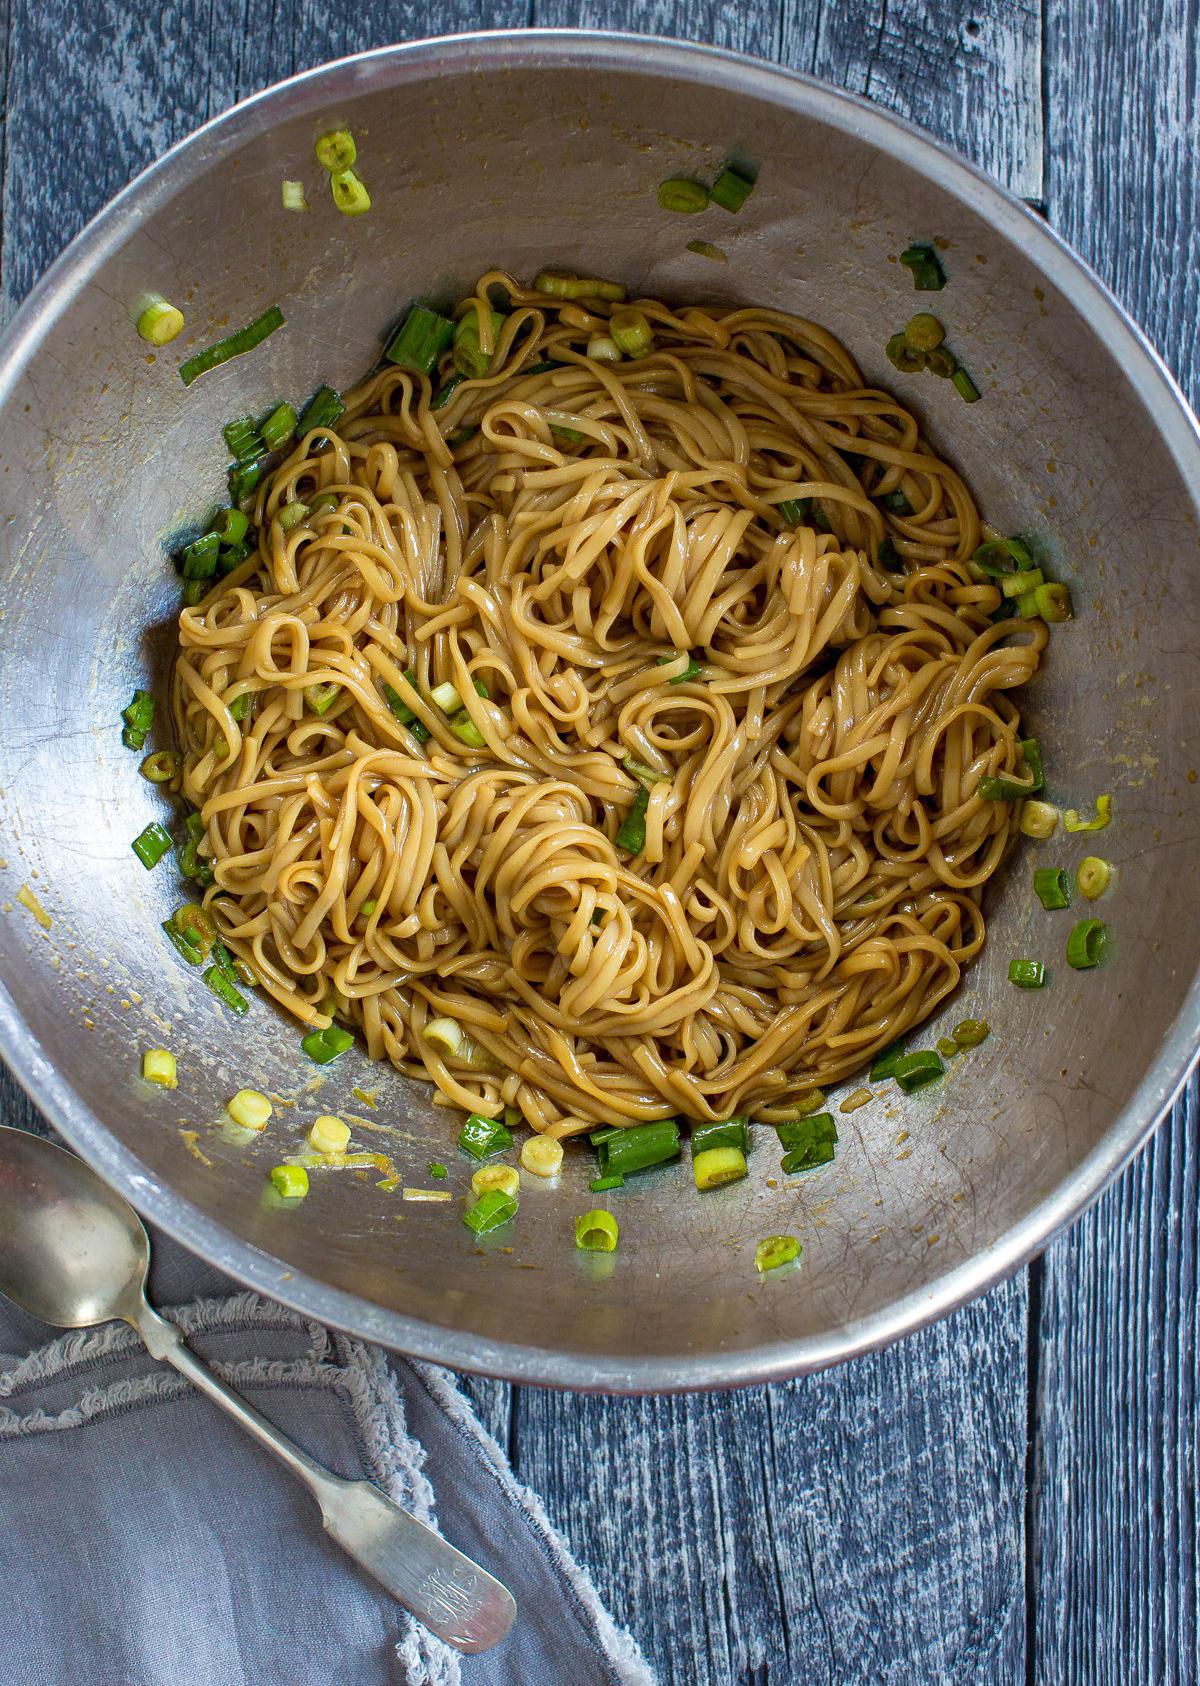 salmon sesame noodles in a bowl